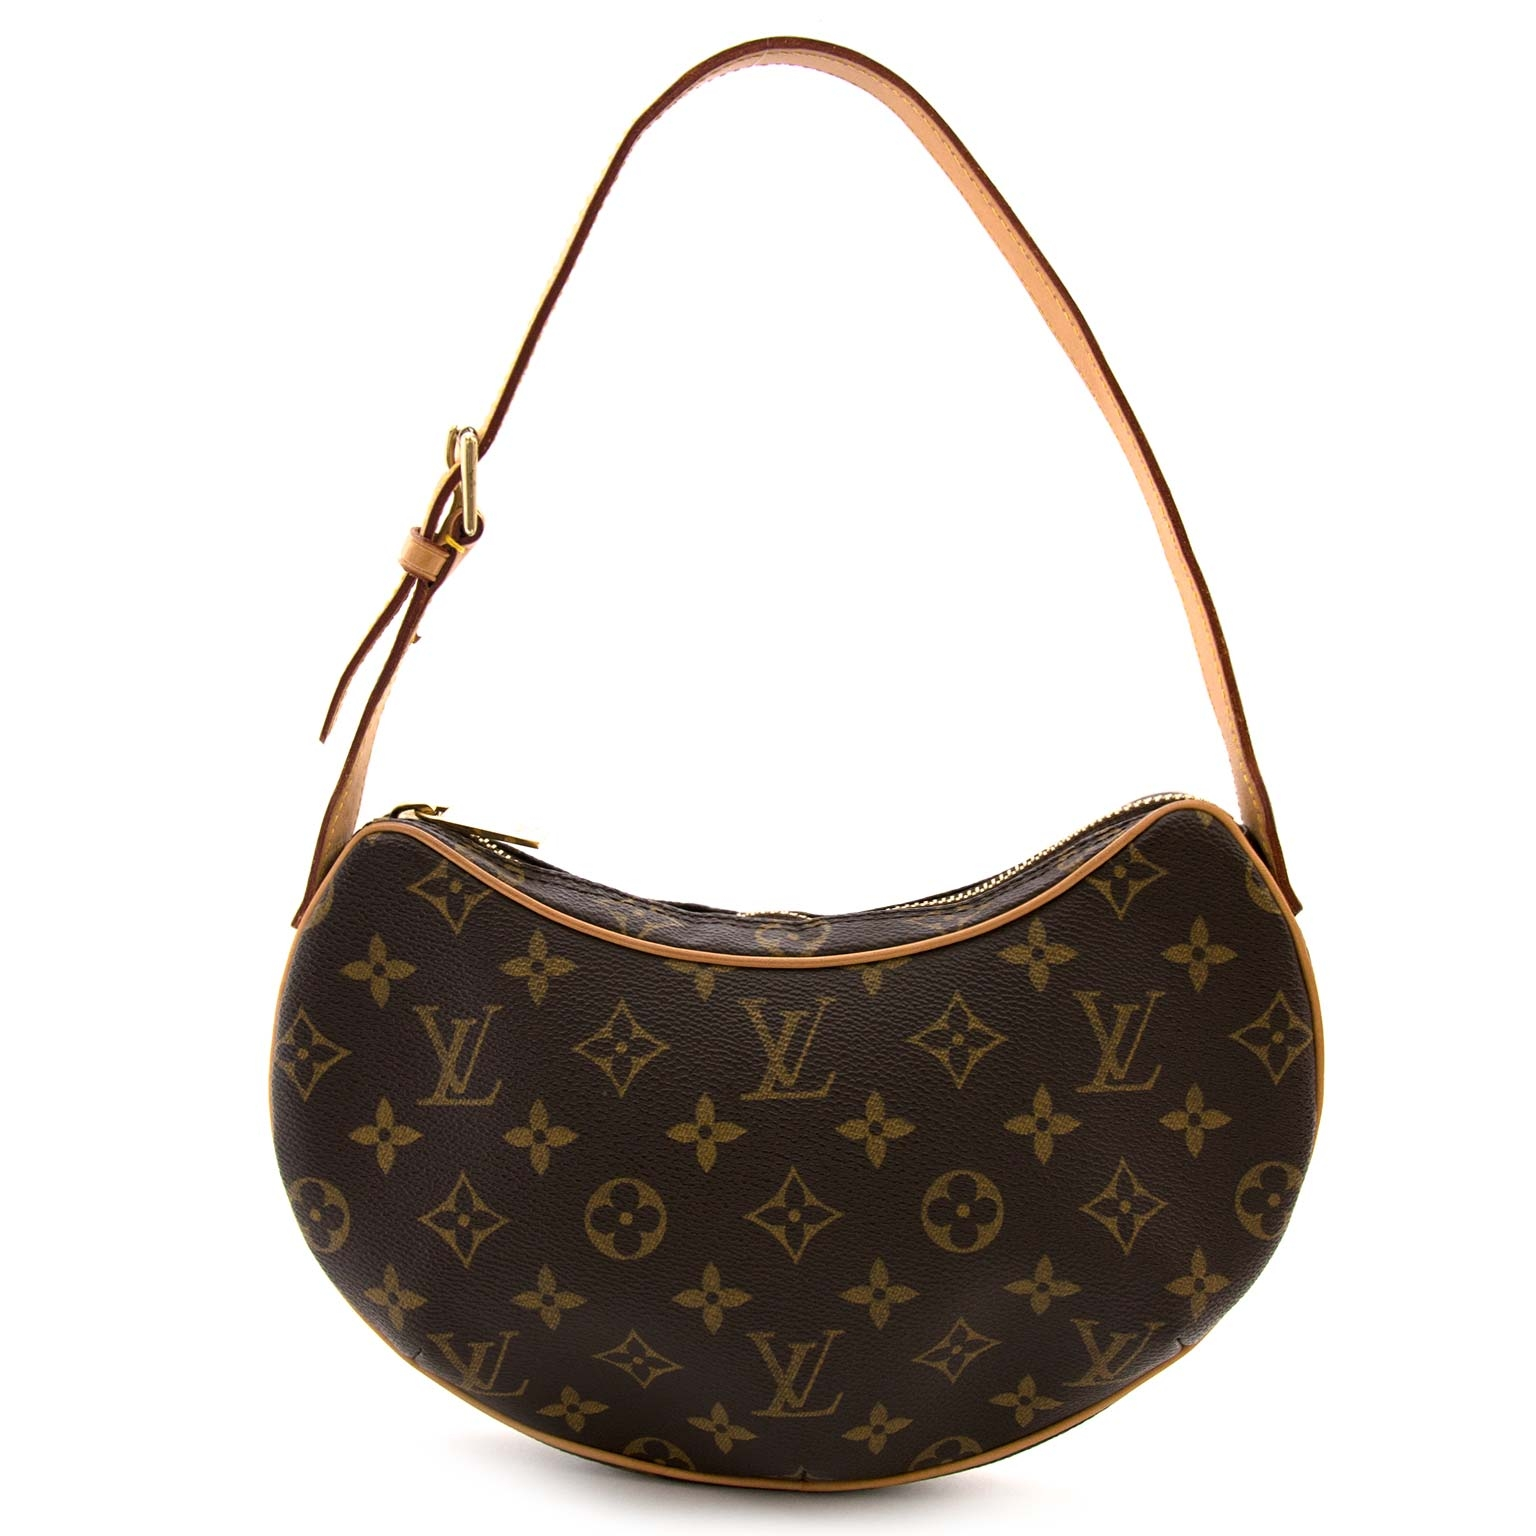 bbc74161edaf Louis Vuitton Monogram Croissant PM for sale online at Labellov Koop en  verkoop uw authentieke Louis Vuitton Monogram Croissant PM